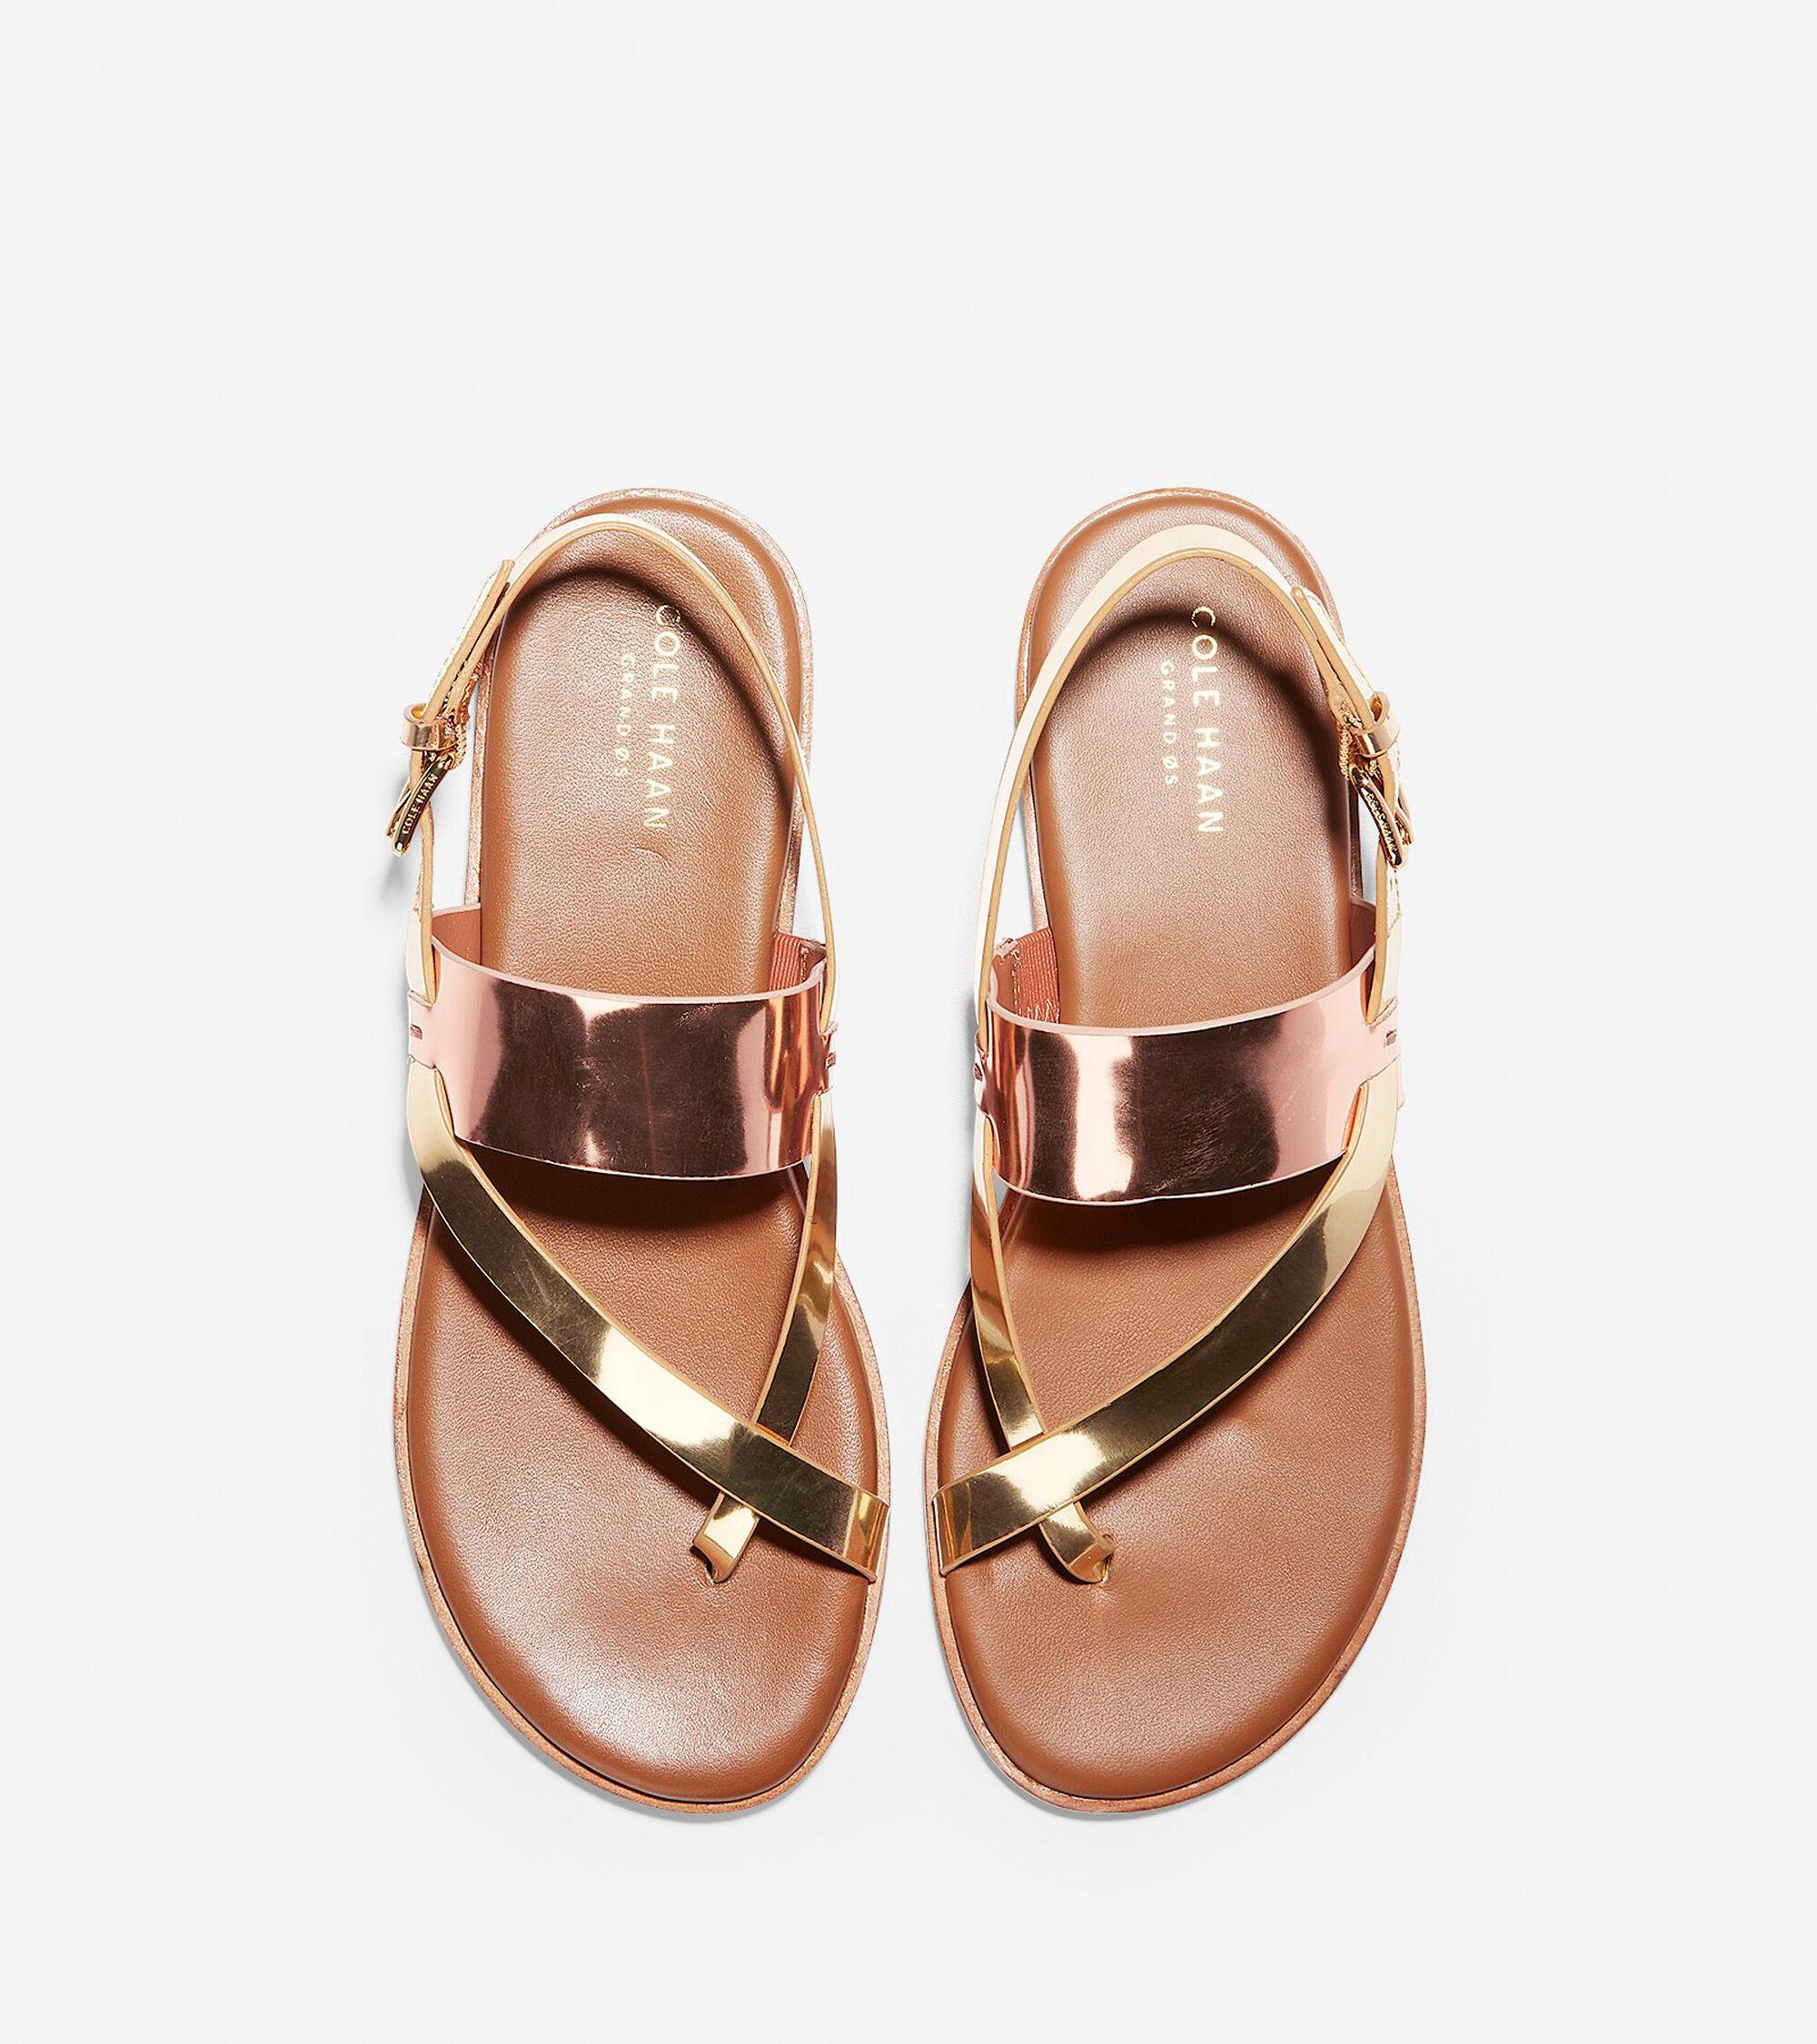 bfad4375a2af ... Anica Thong Sandal · Anica Thong Sandal · Anica Thong Sandal.  COLEHAAN